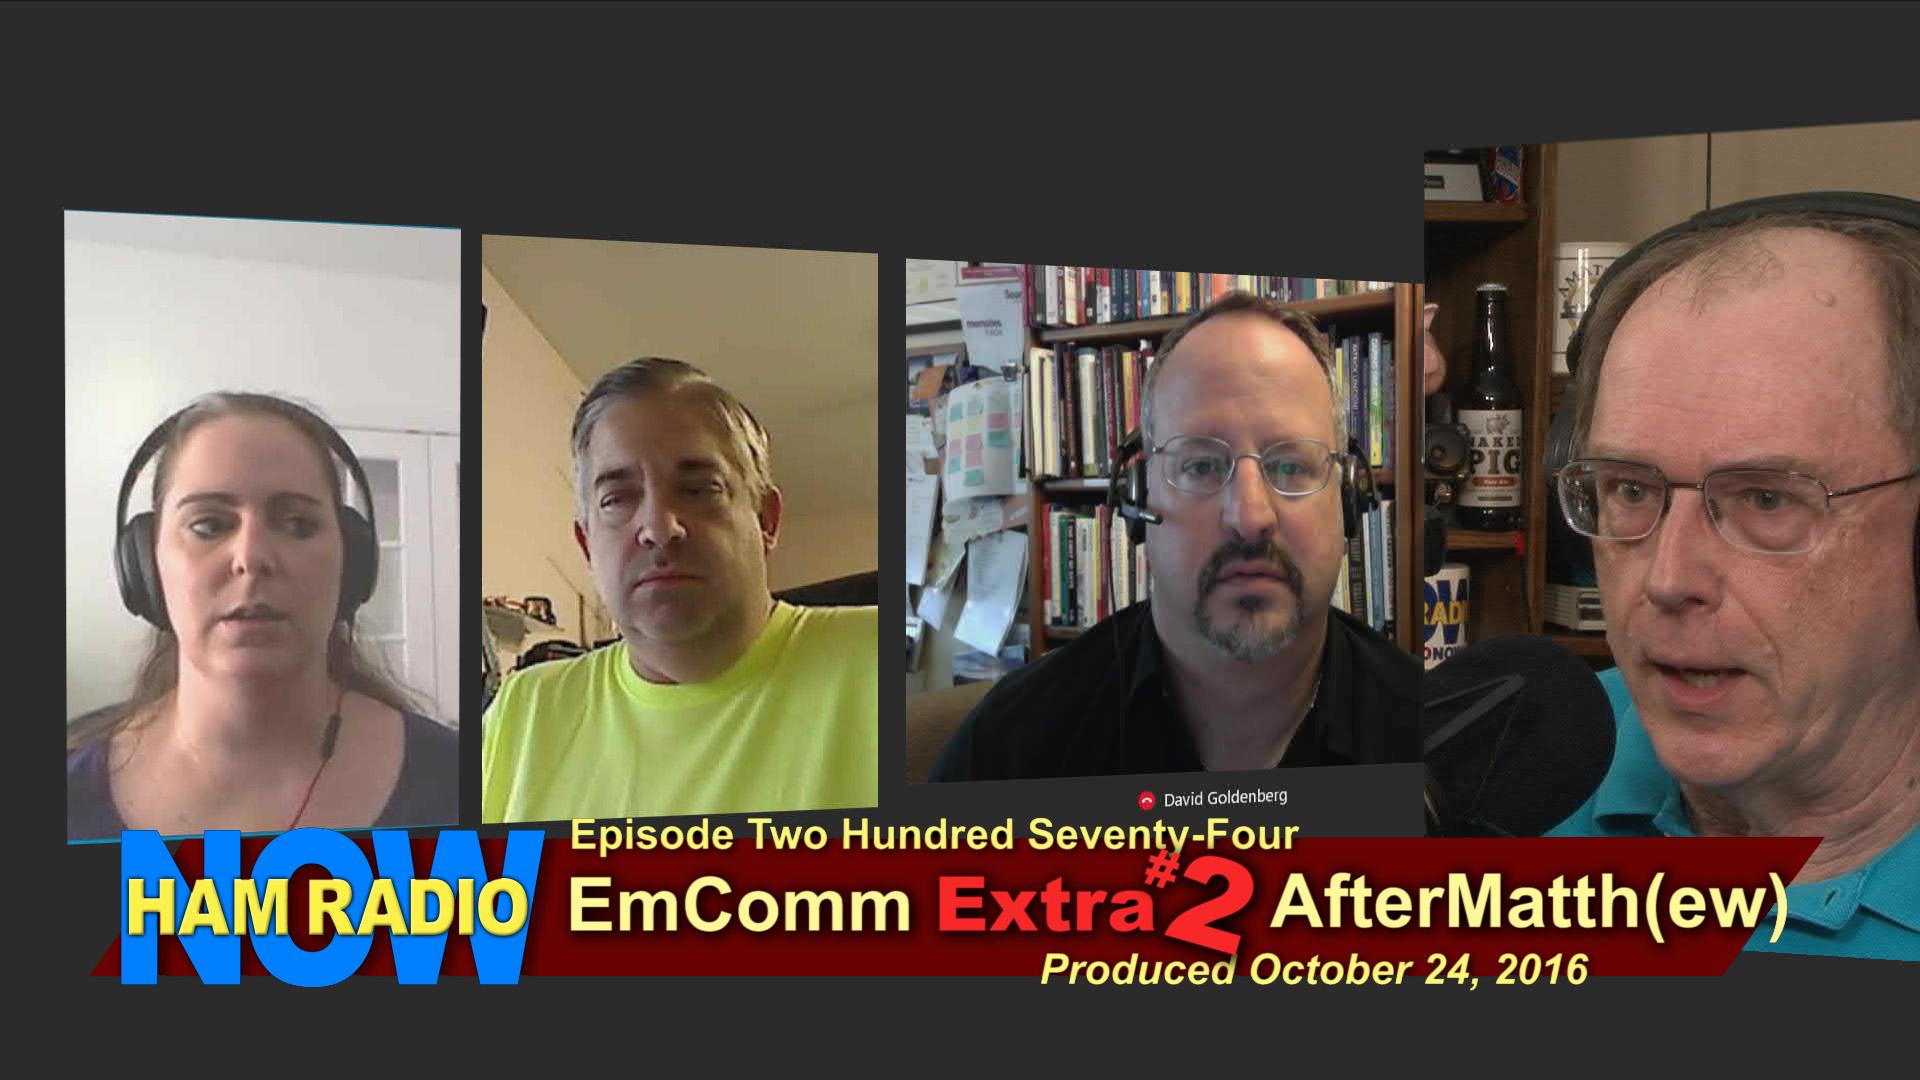 HRN 274 - EmComm Extra #2: AfterMatth(ew) on HamRadioNow